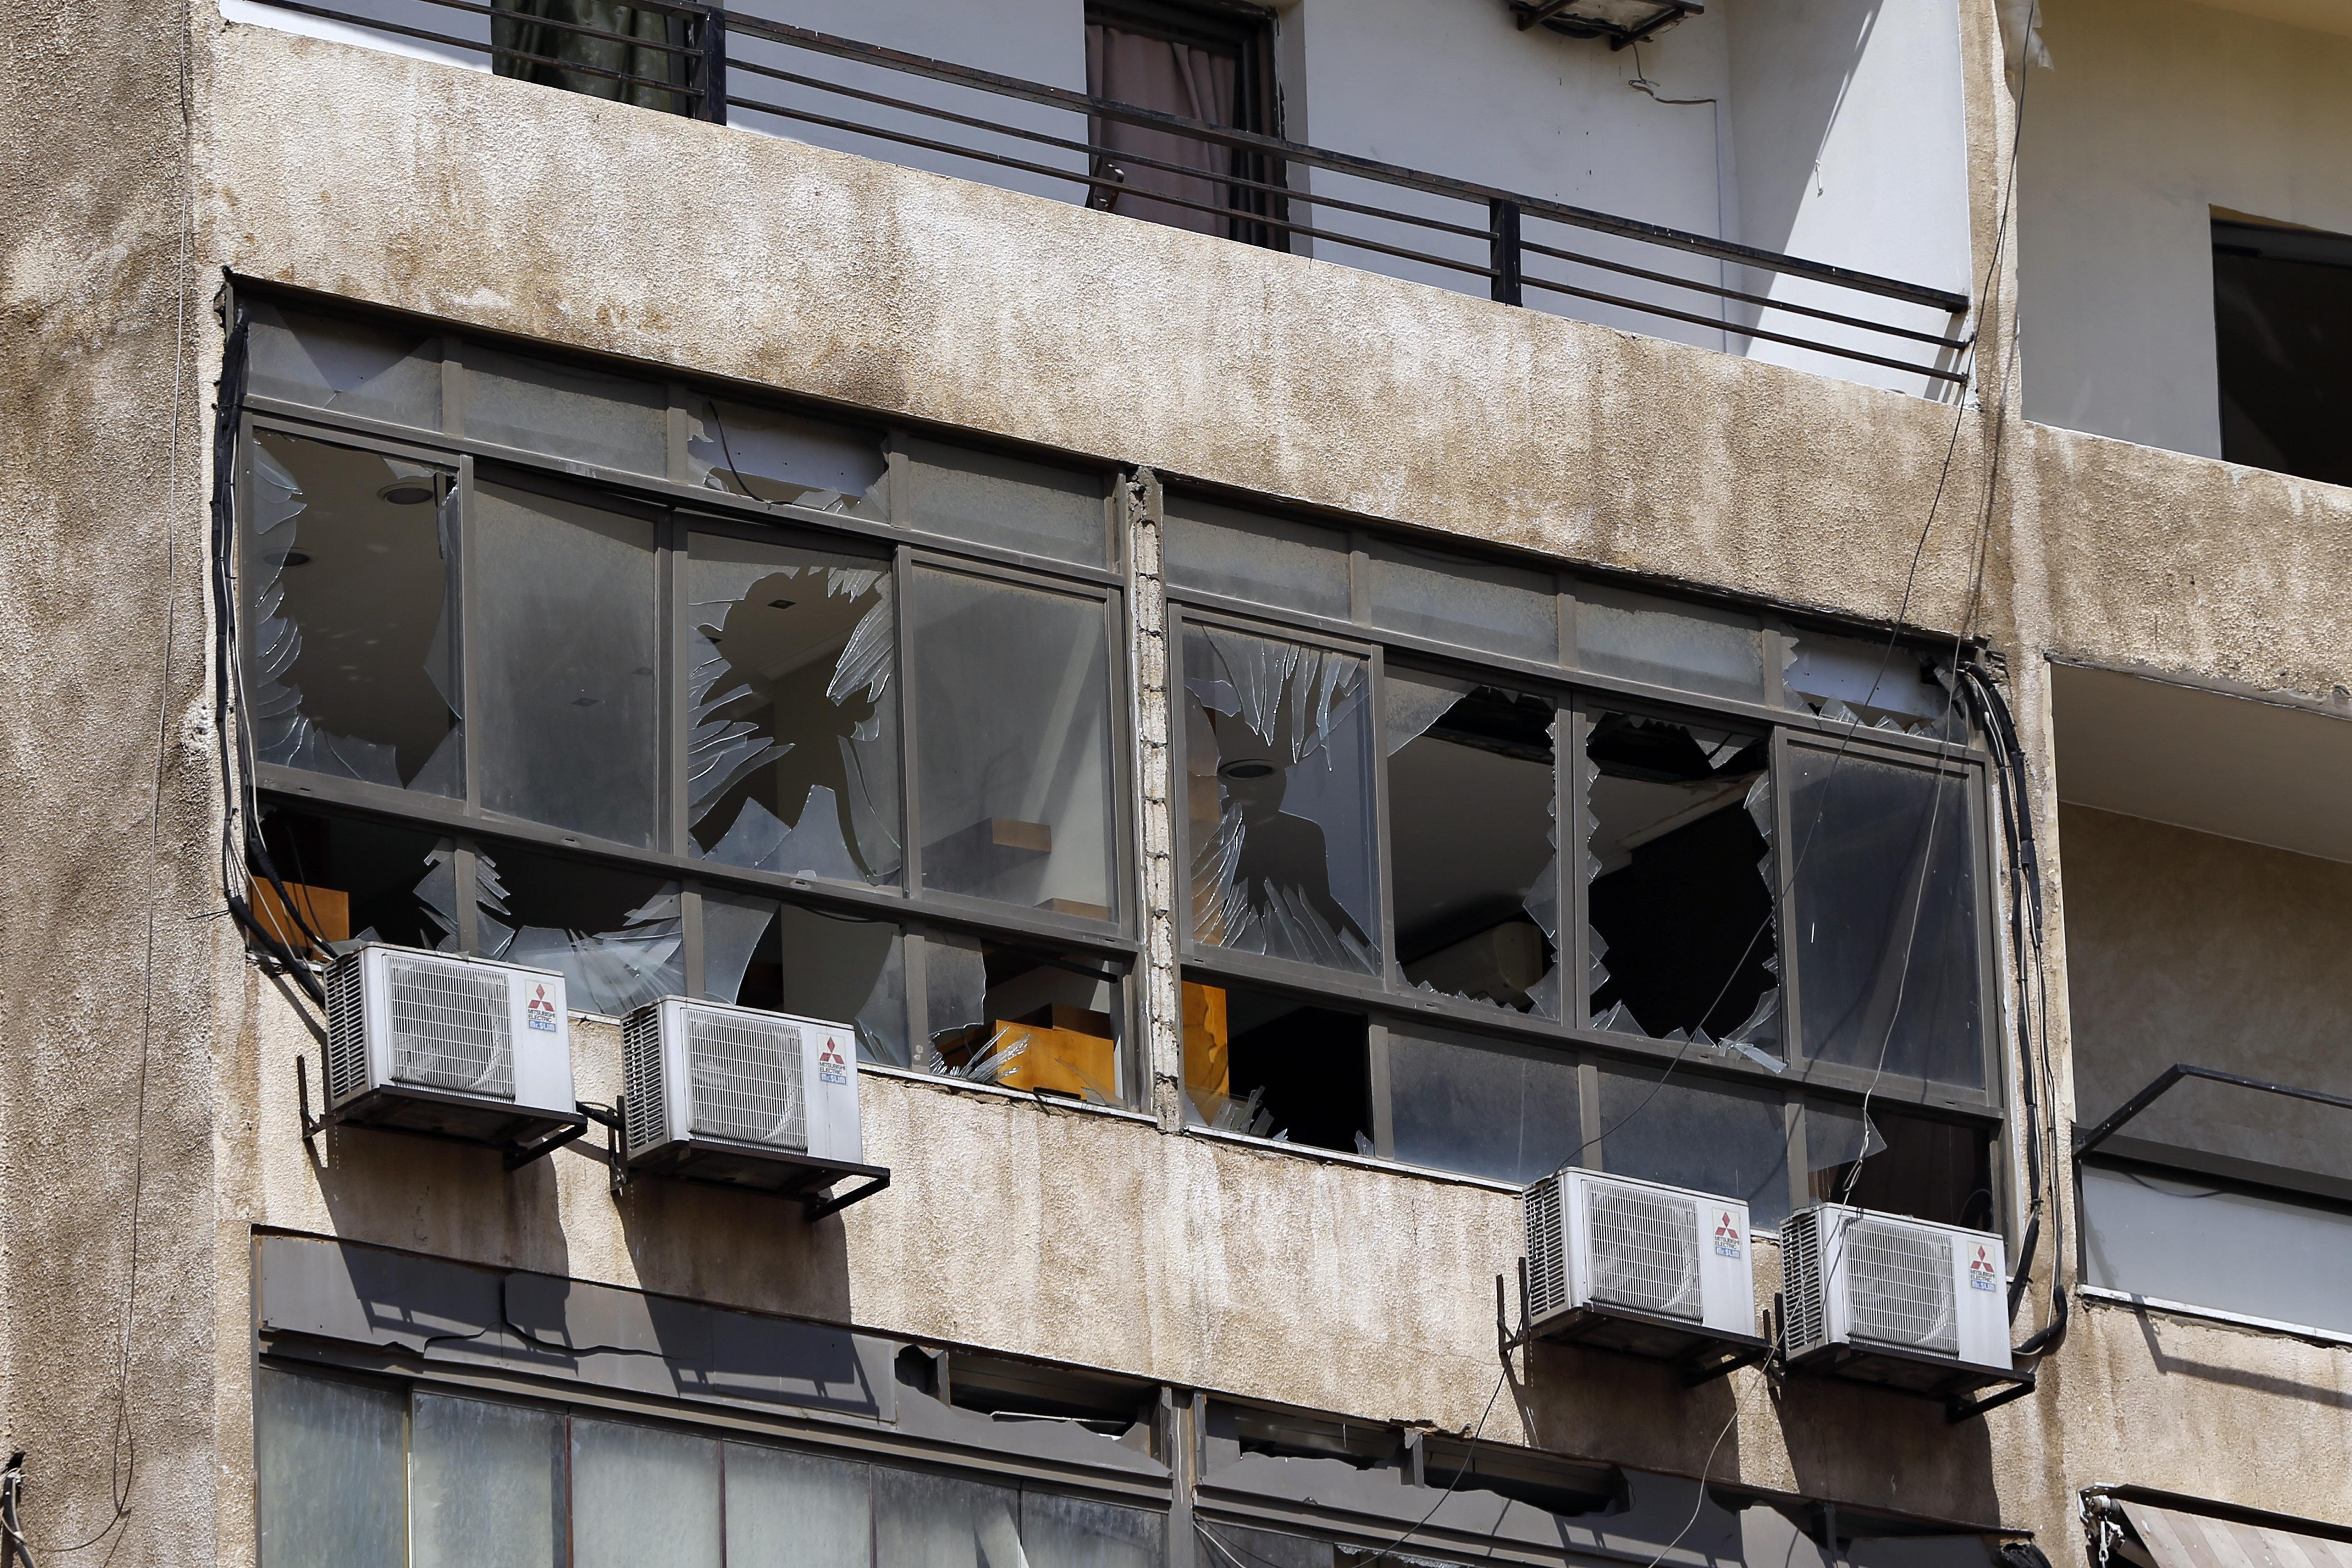 UN warns ceasefire violations could spark Lebanon-Israel war